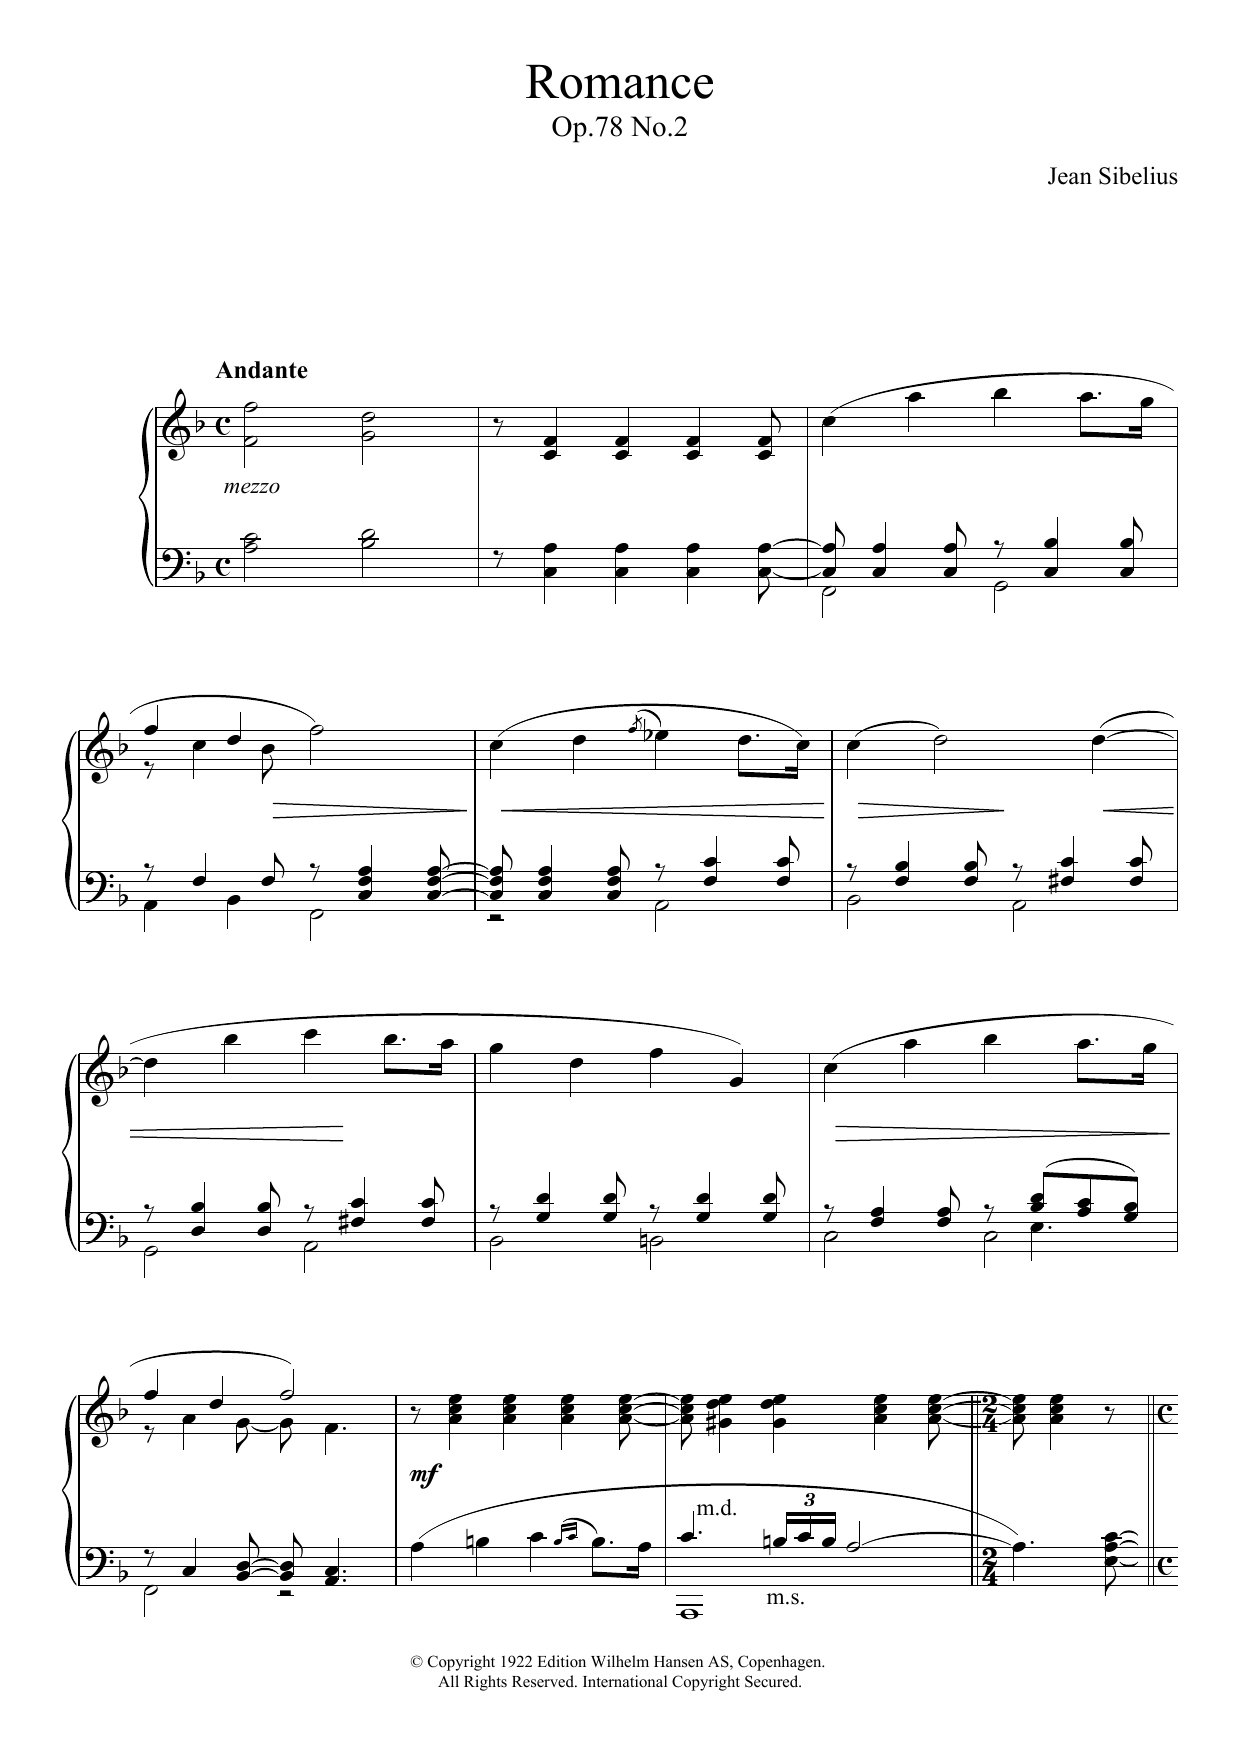 Jean Sibelius - Romance, Op.78 No.2